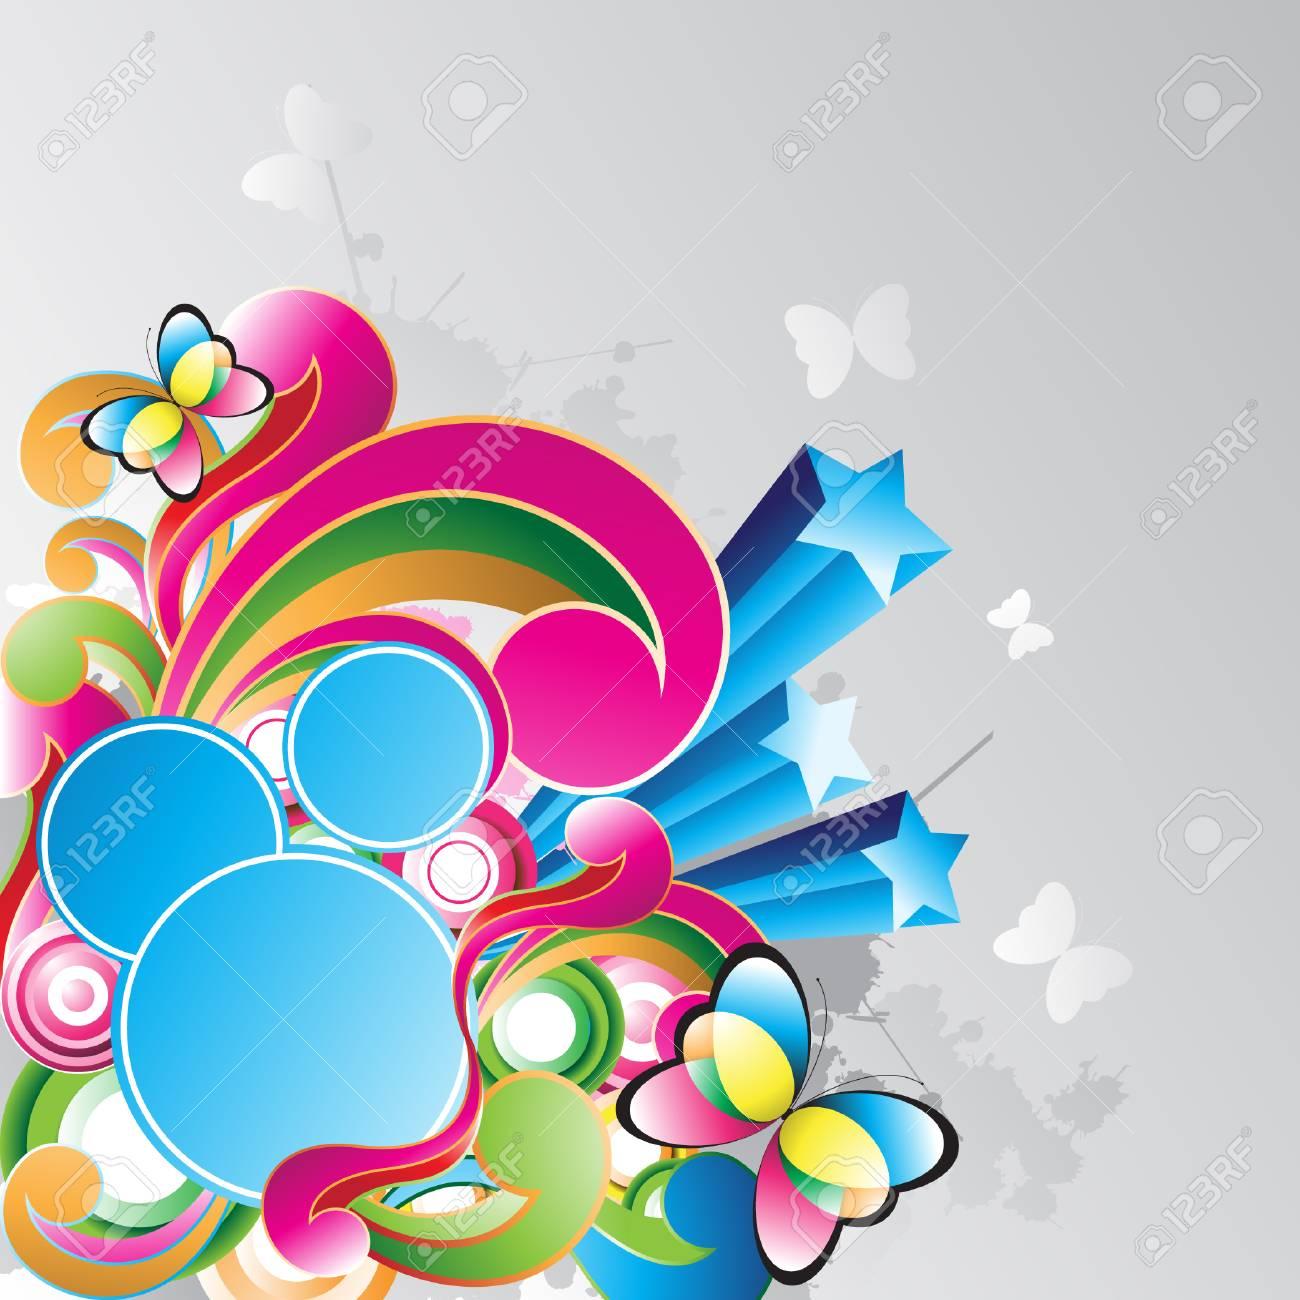 abstract vector illustration Stock Vector - 4896394